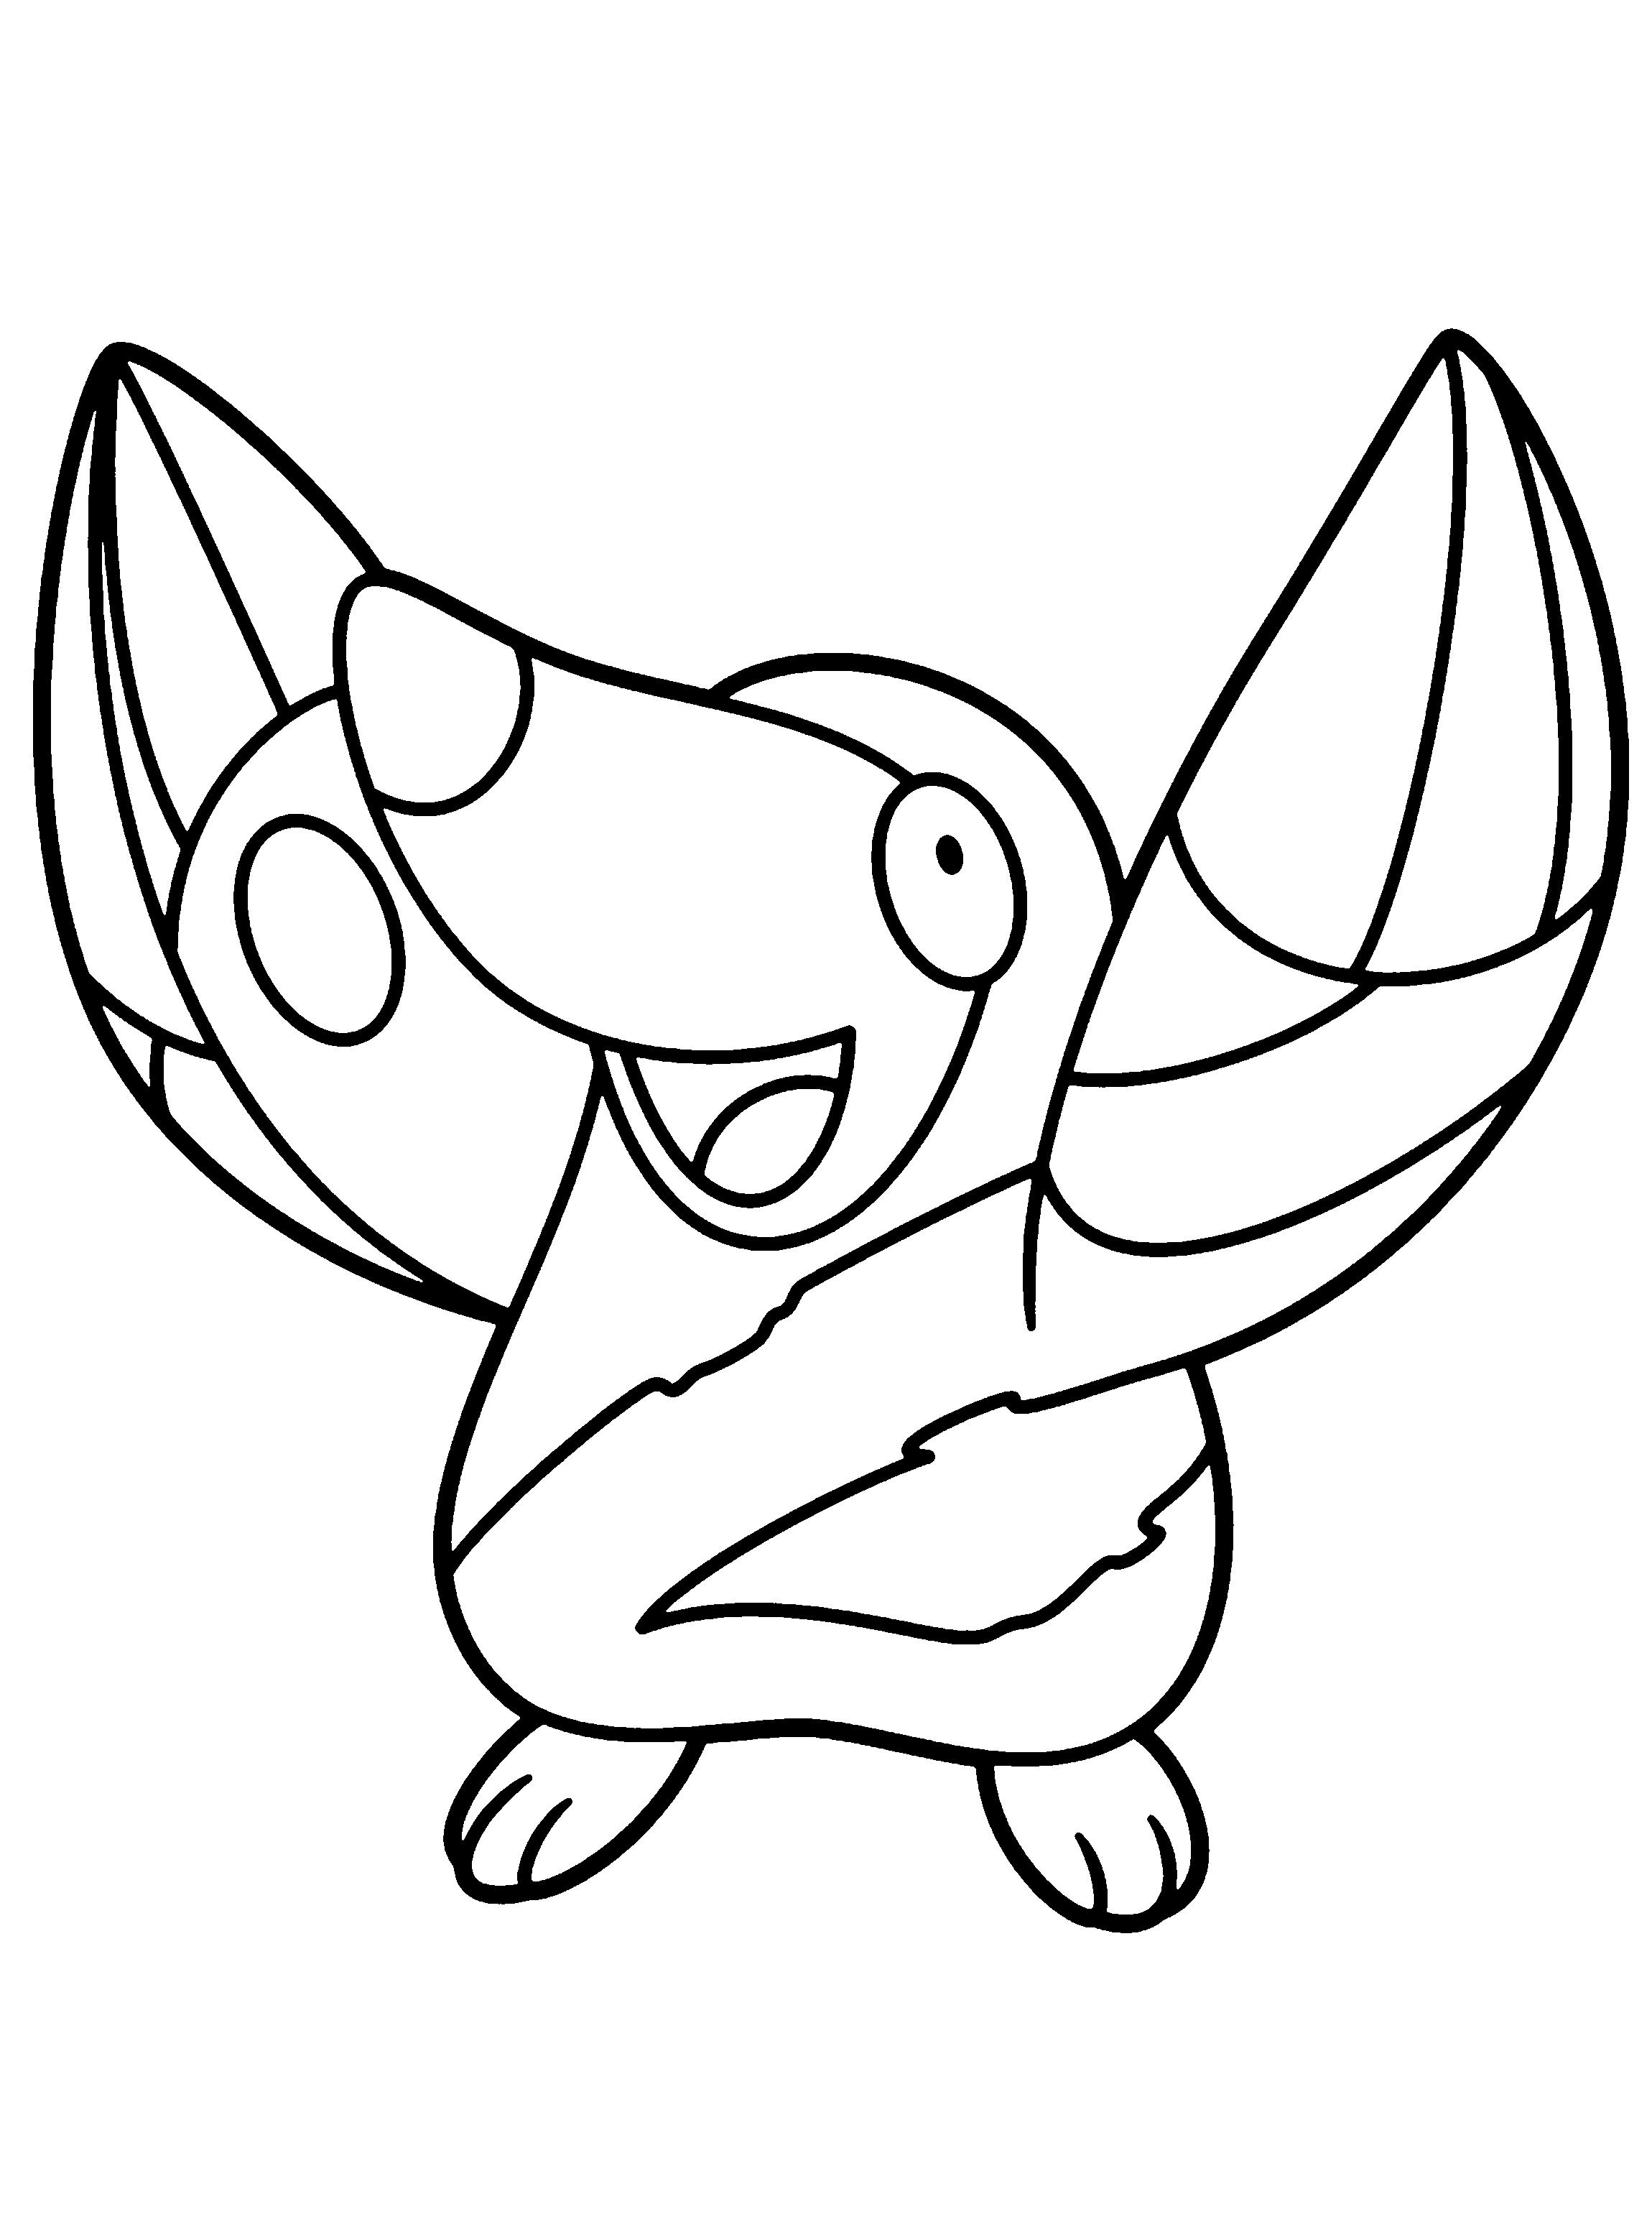 Kleurplaat Mol Coloriage Rototaupe Pokemon 224 Imprimer